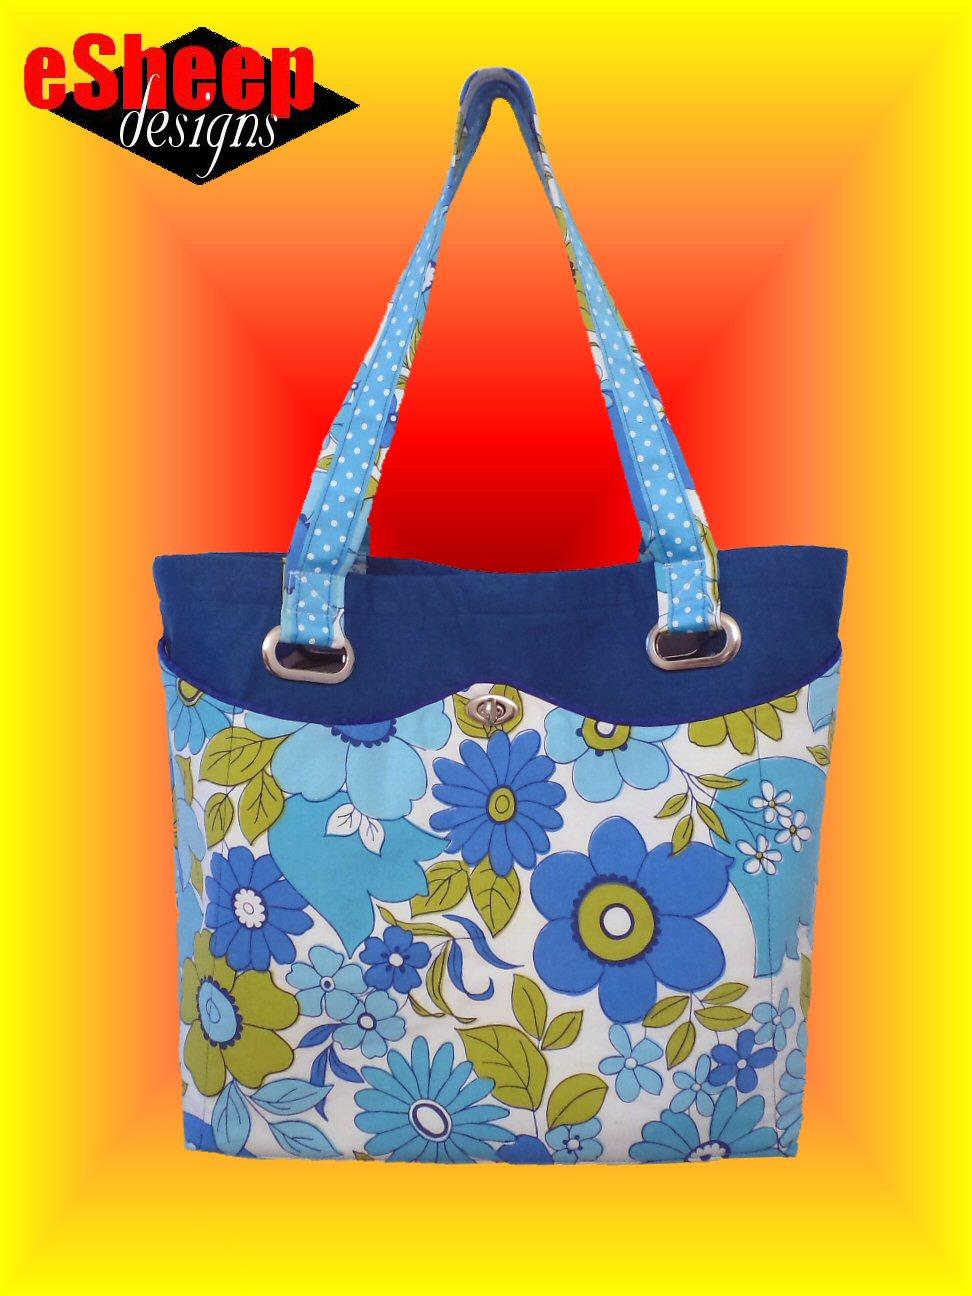 eSHEEP DESIGNS: Customizing a Free Tote Bag Pattern [Pt 1]